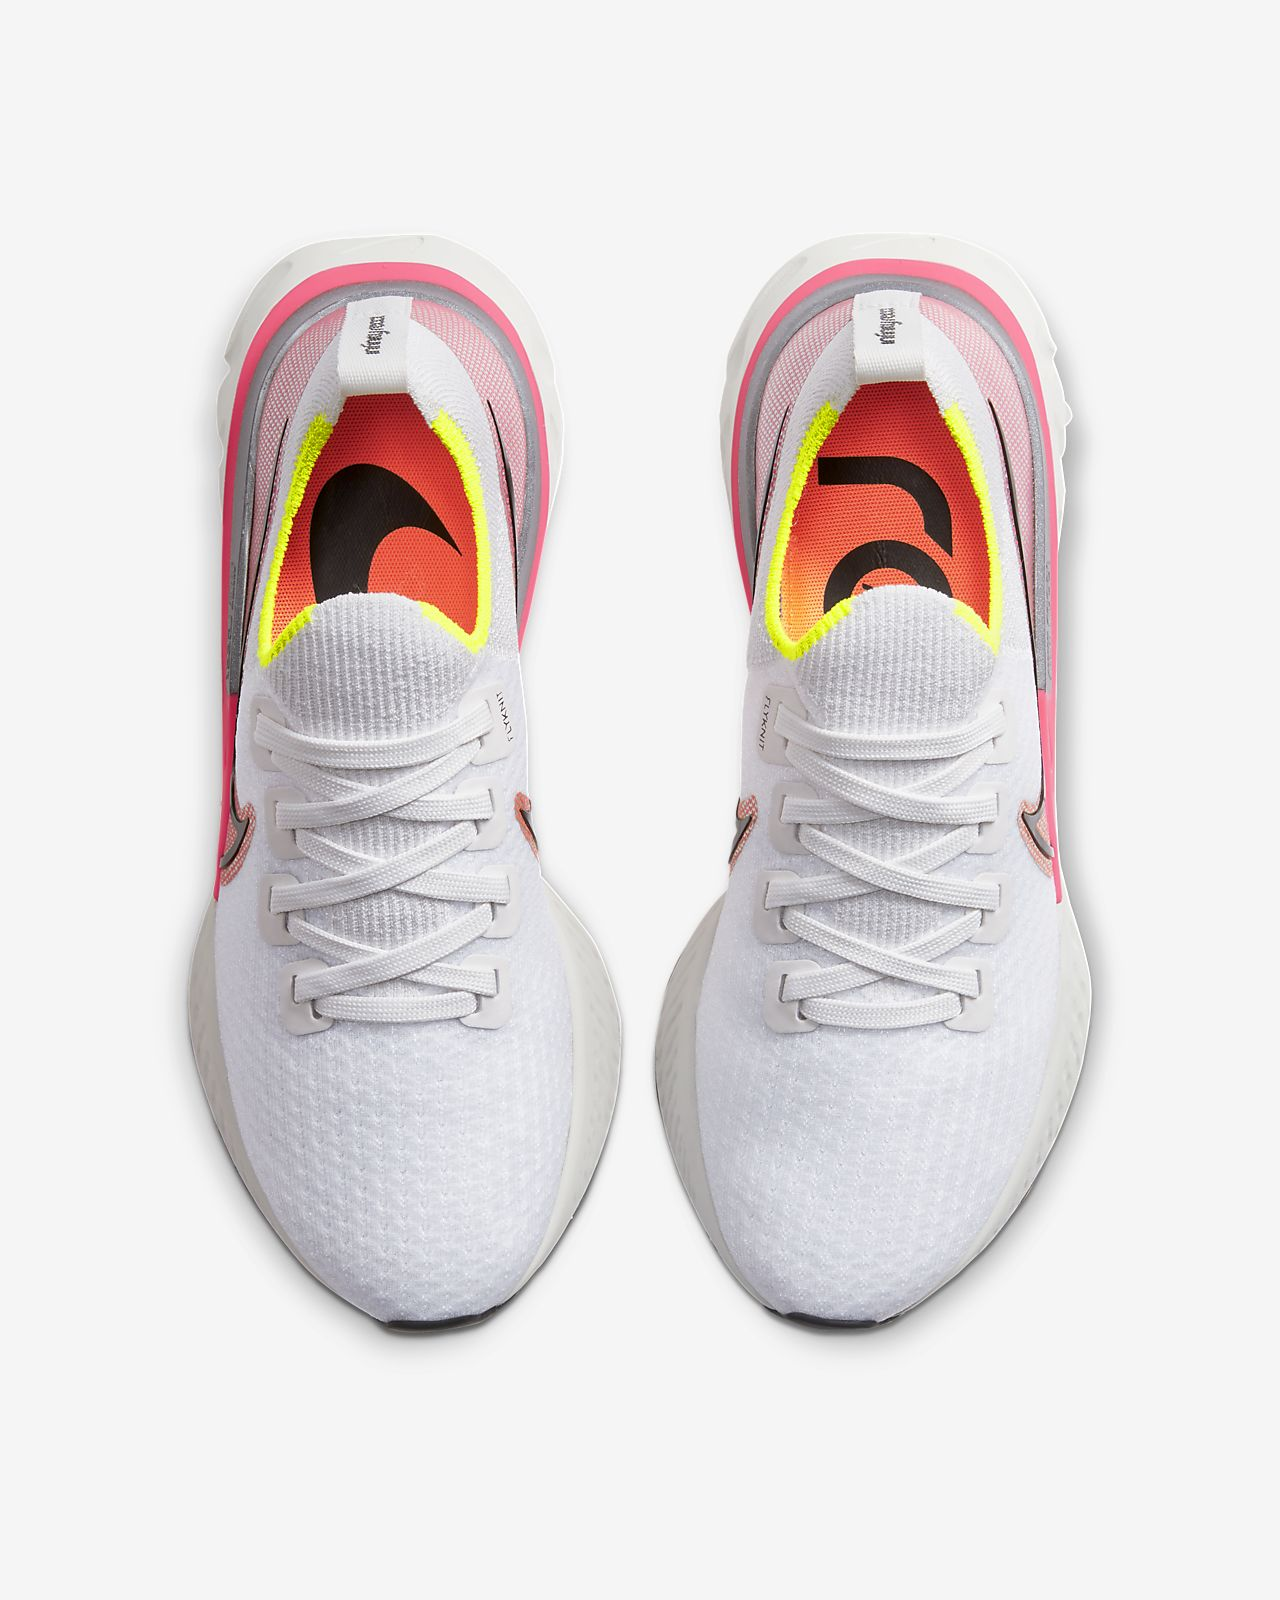 Road Trail Run: Nike React Infinity Run Review. A softer